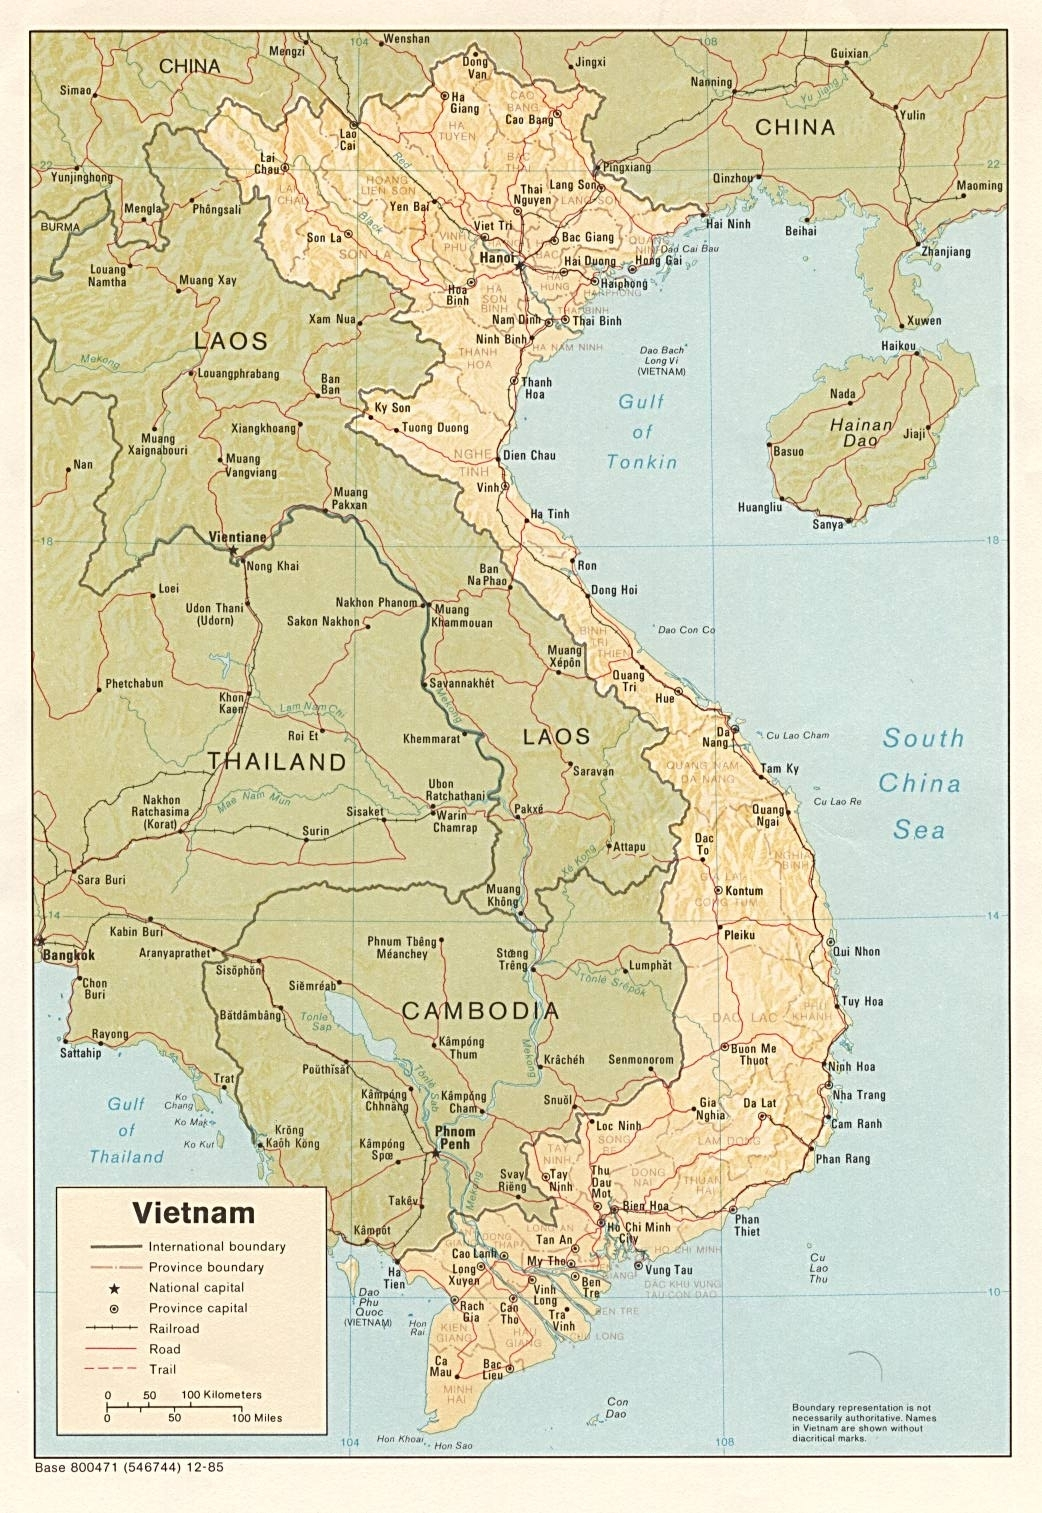 Grover Furr'S Vietnam War Page